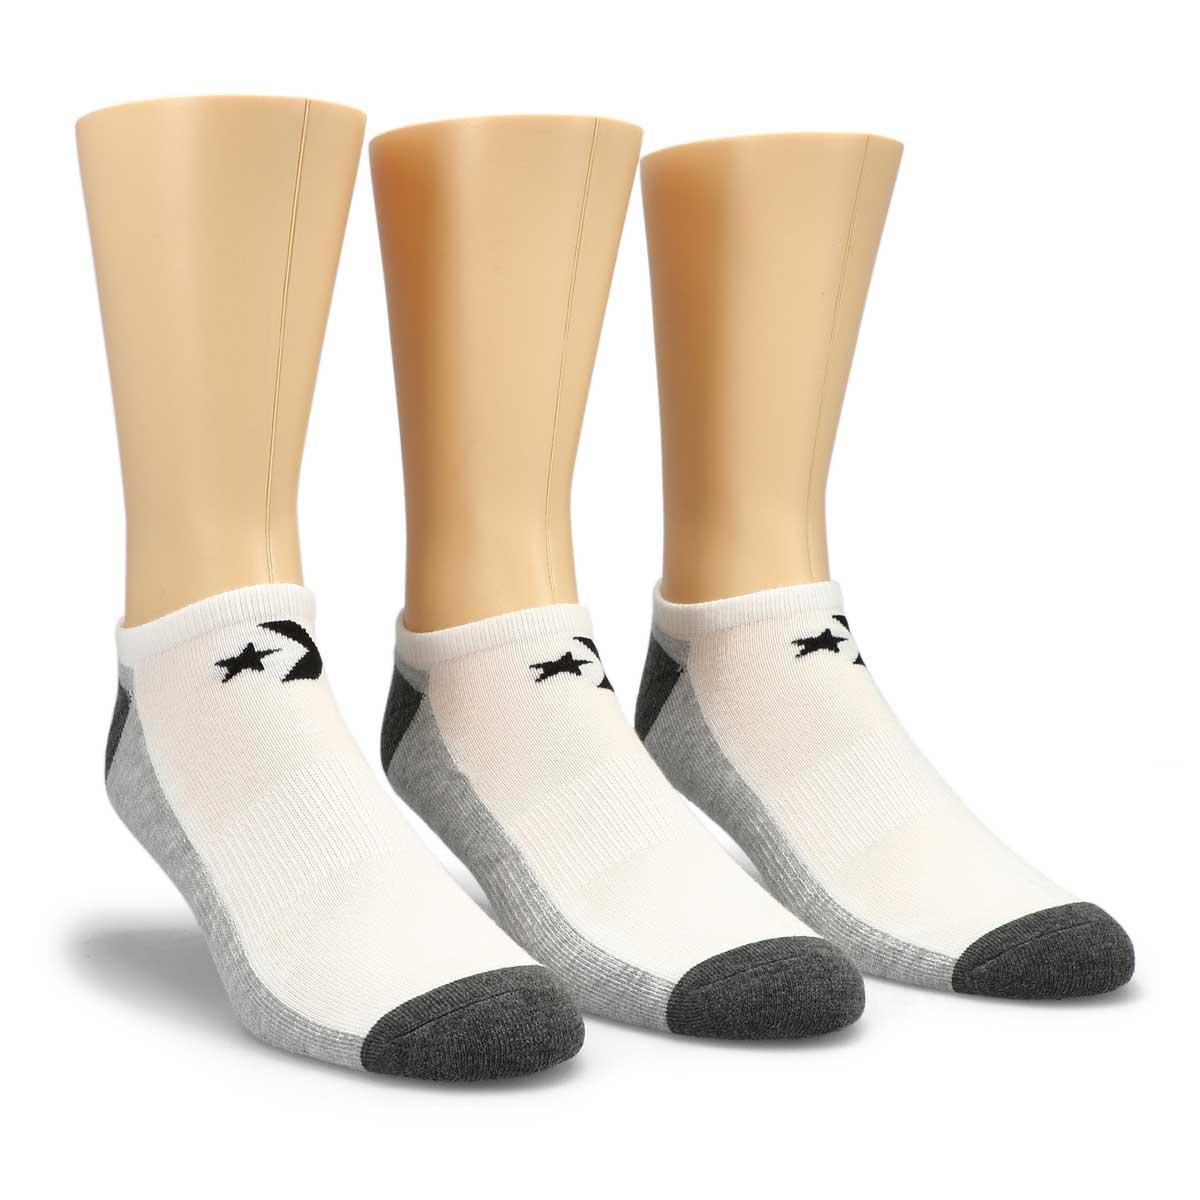 Men's Converse white/grey no show socks - 3 pack